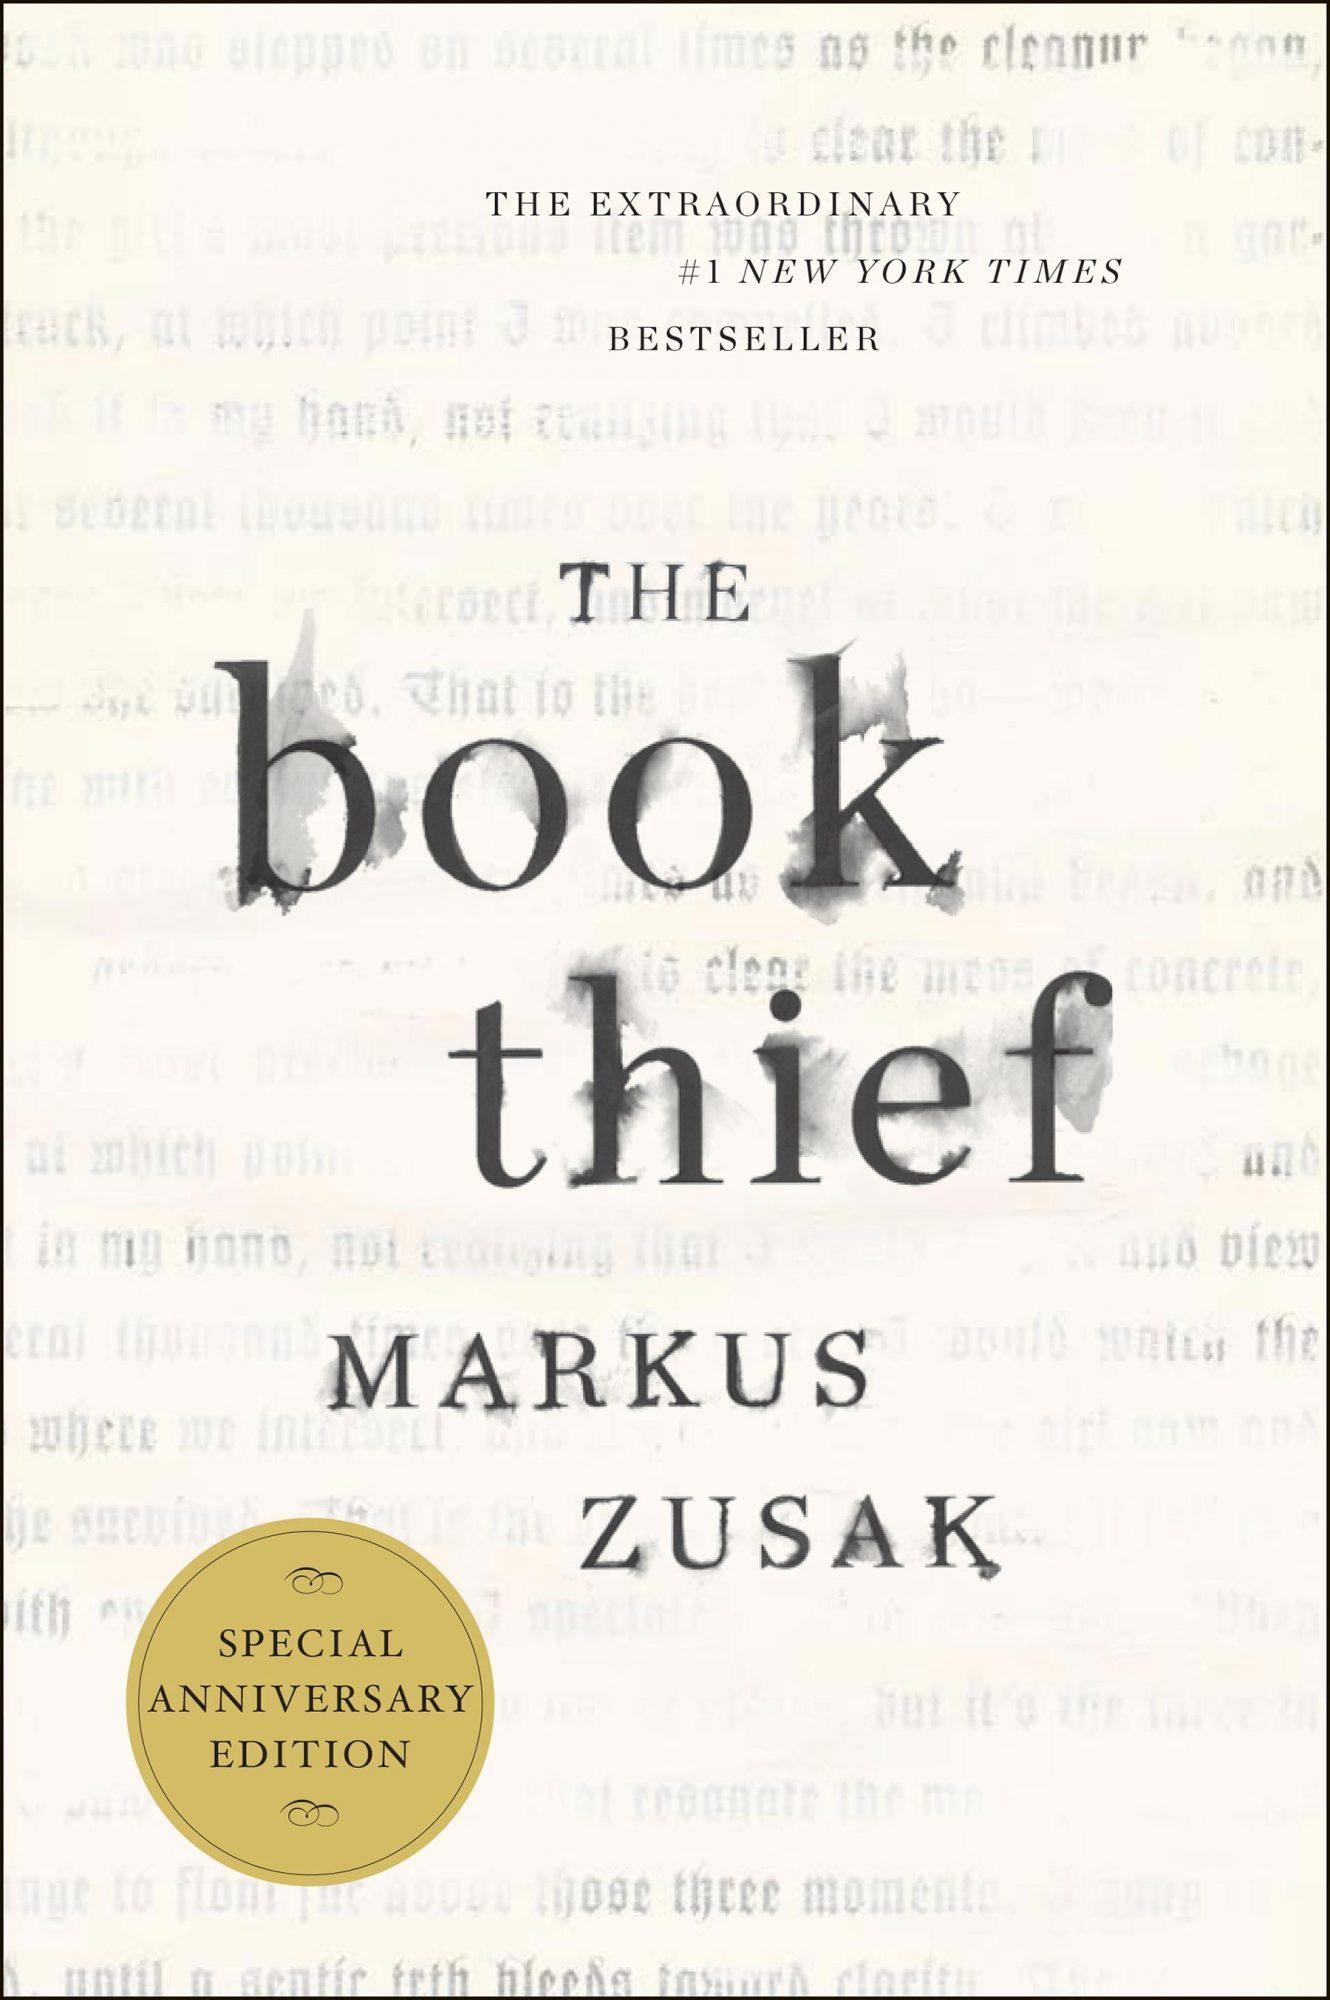 The Book Thief - Special Anniversary Edition (3/8/15)by Markus Zusak